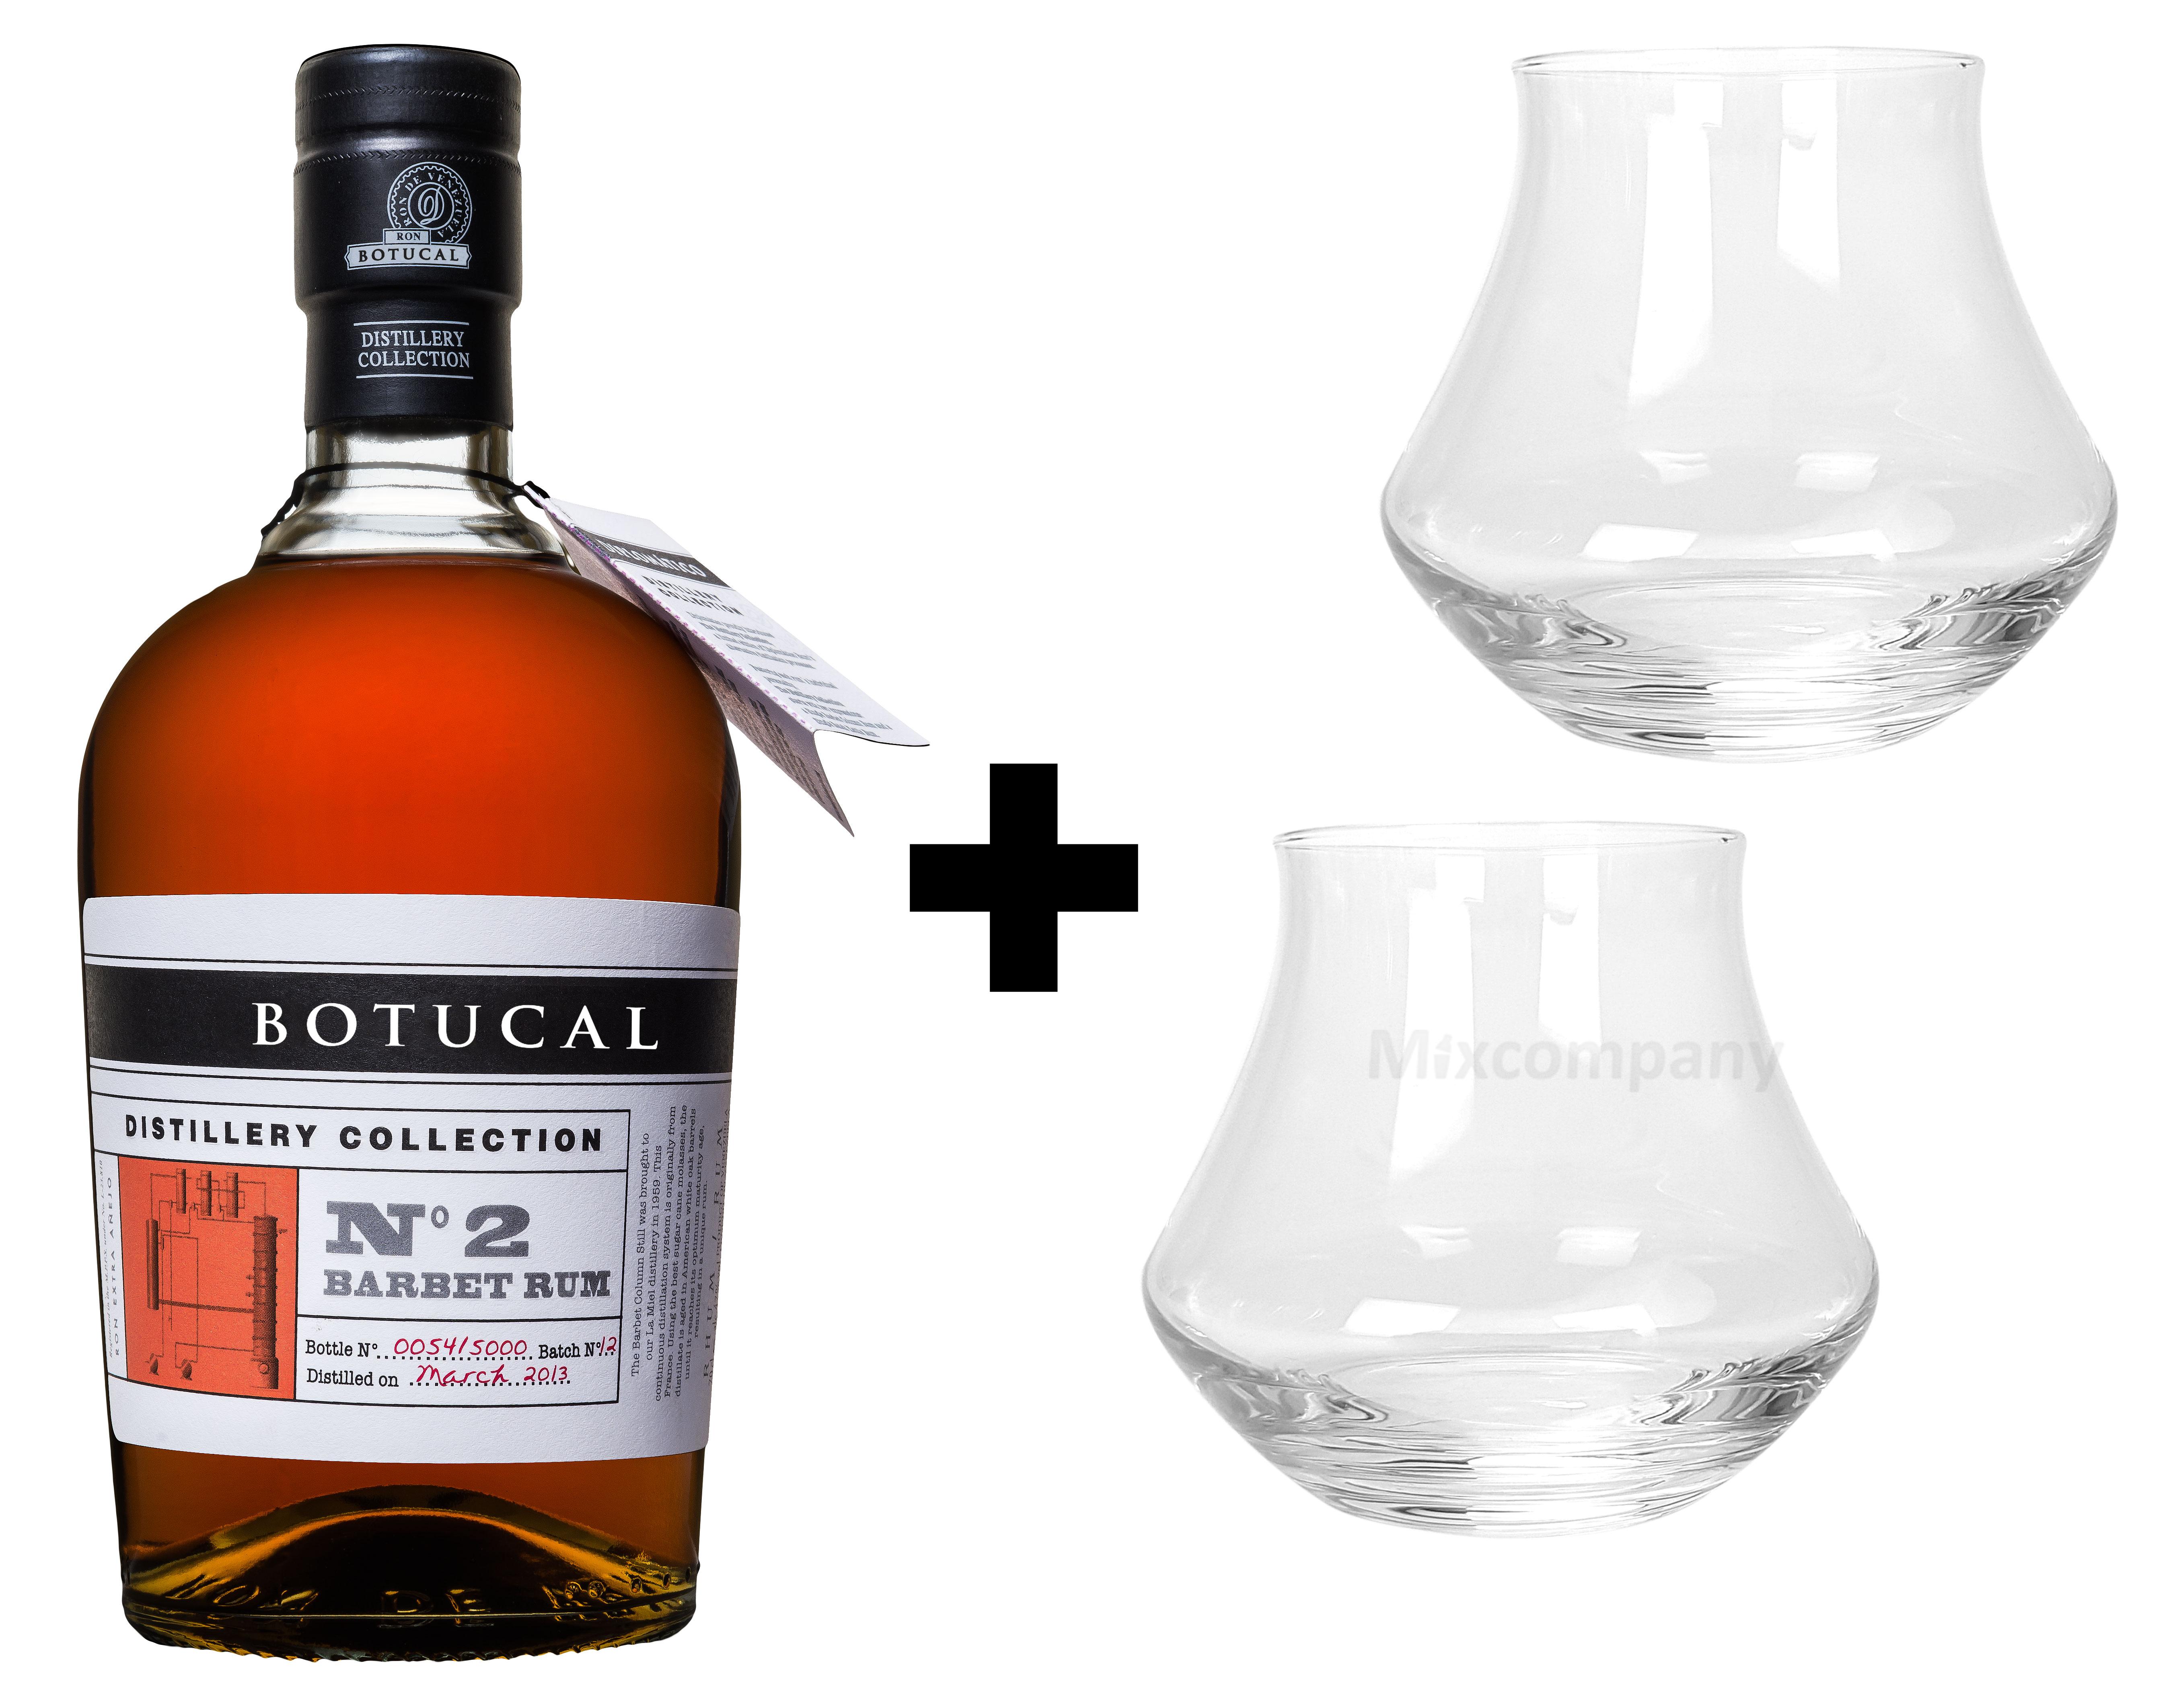 Botucal No2 Barbet Rum Rhum 0,70l (47% Vol) exklusive Sonderausgabe special limited edition distillery collection + 2 Tumbler Gläser Glas Longdrinkgläser Set- [Enthält Sulfite]